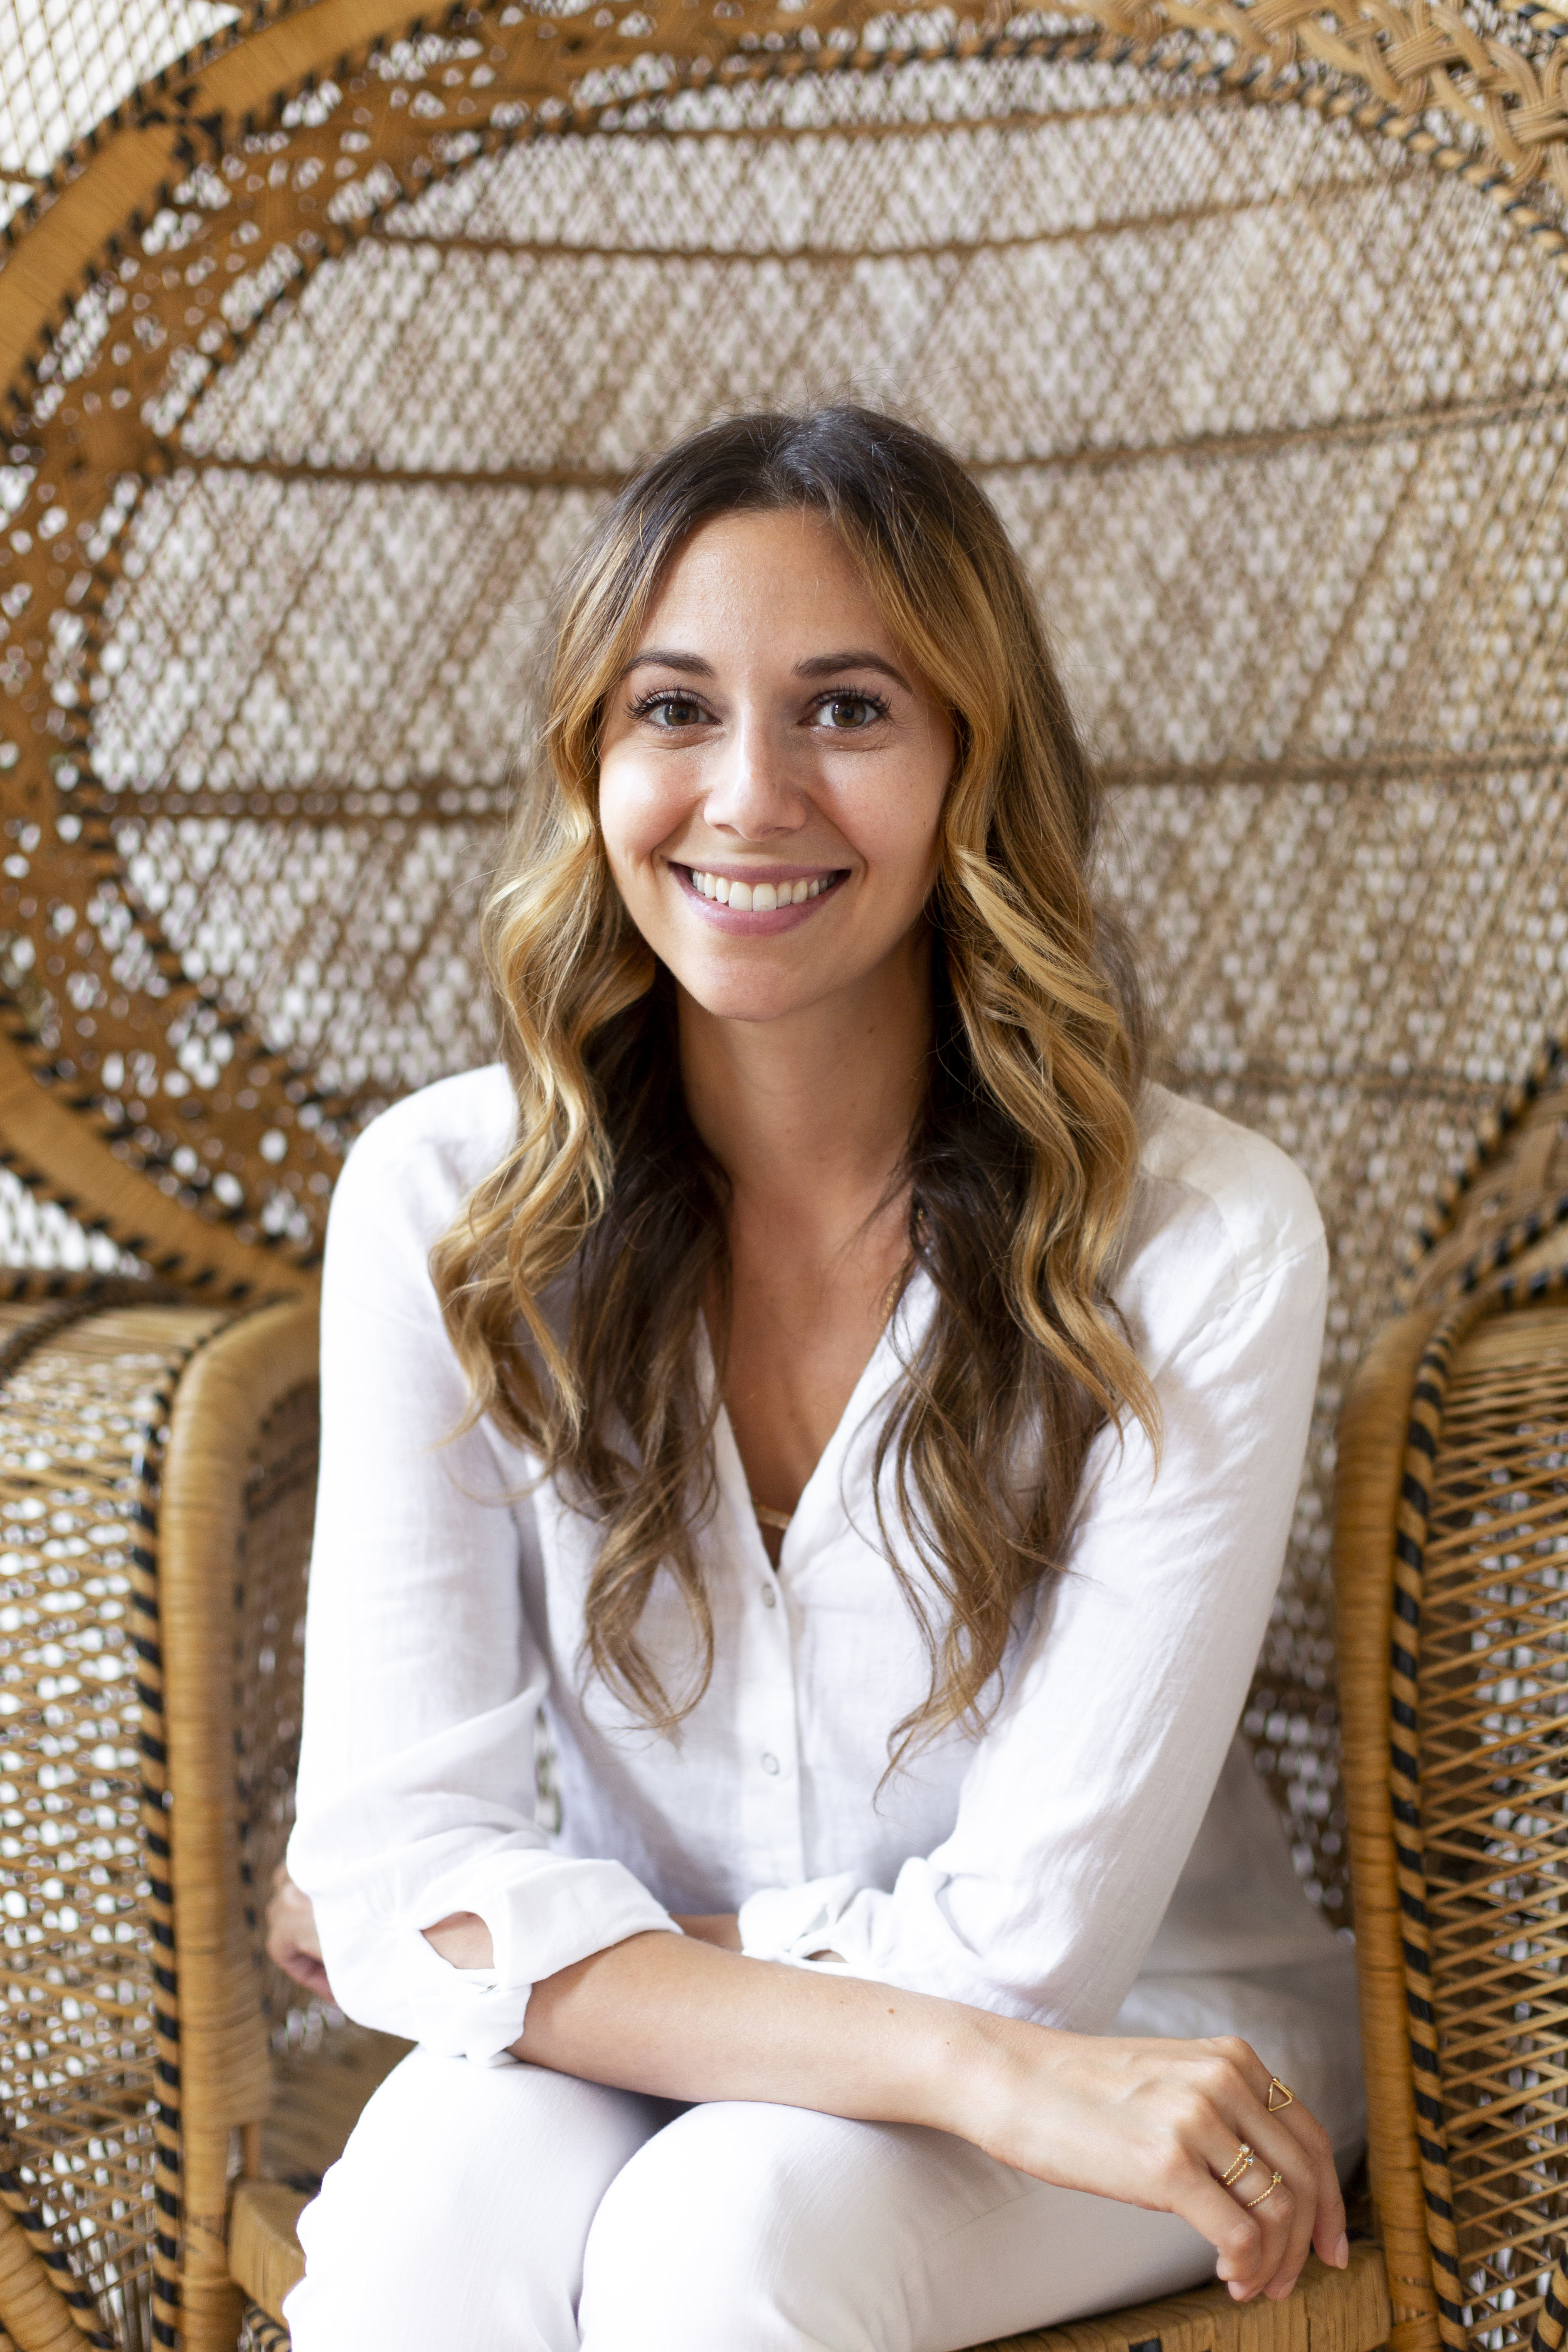 Rachel Beider at PRESS Massage in Dumbo Brooklyn